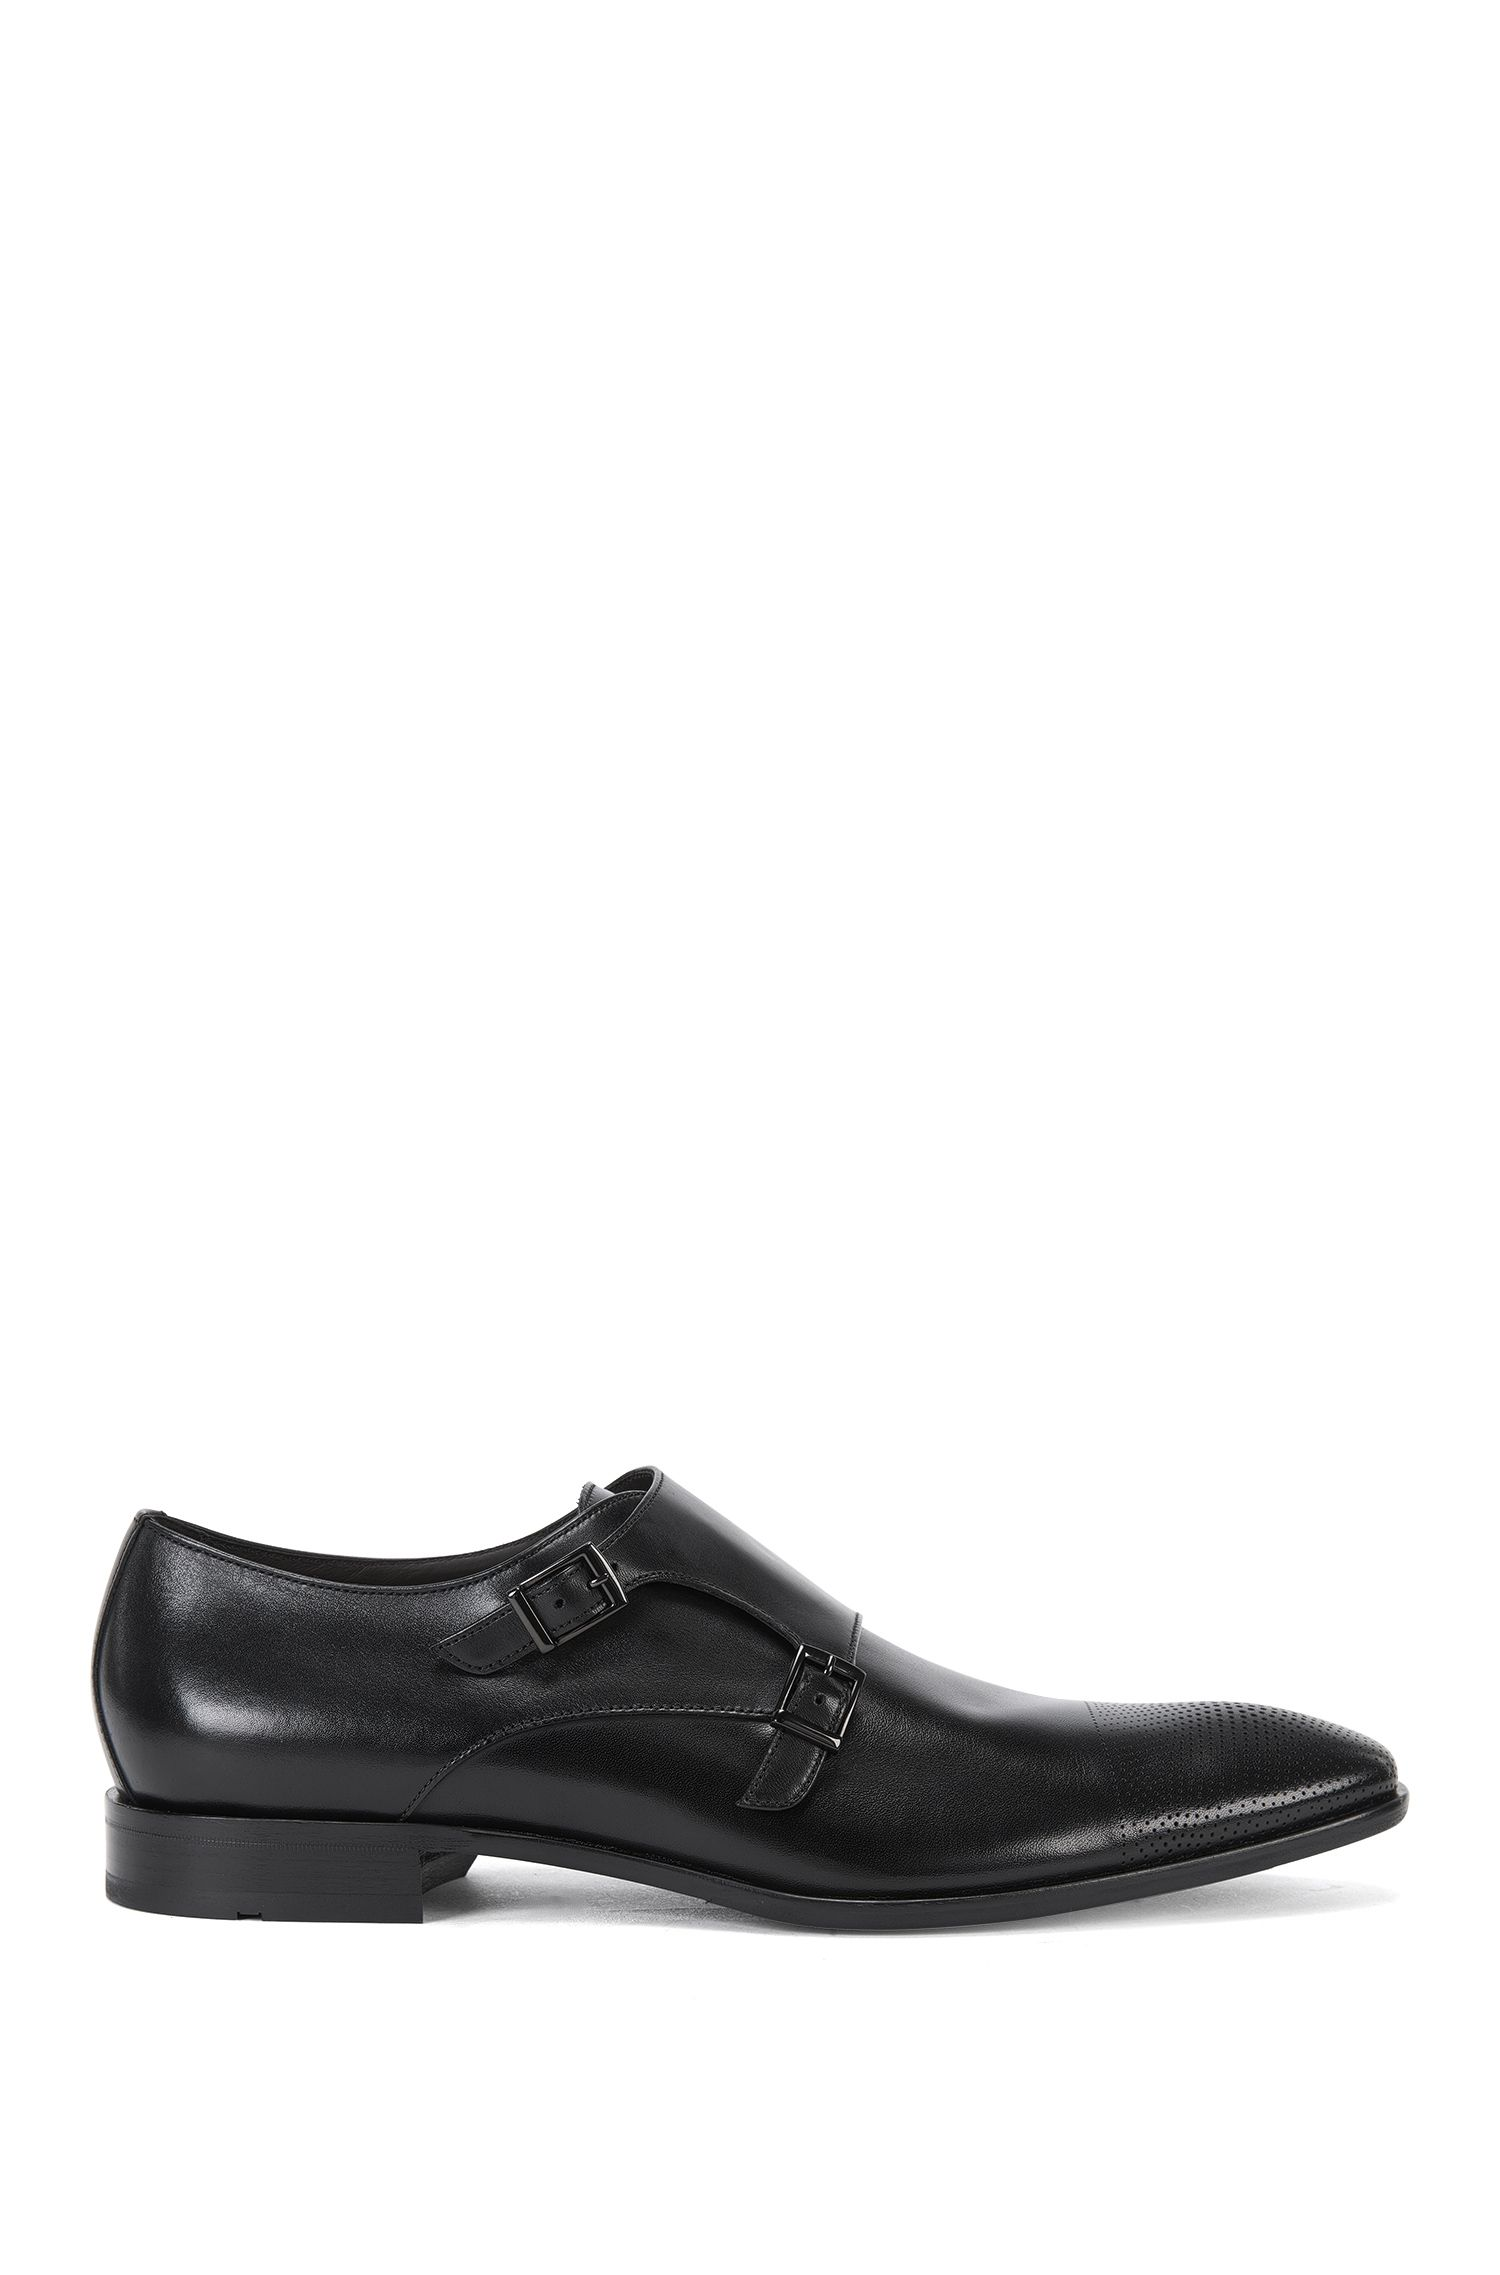 Leather Monk Strap Dress Shoe | Chelsea Monk Clts